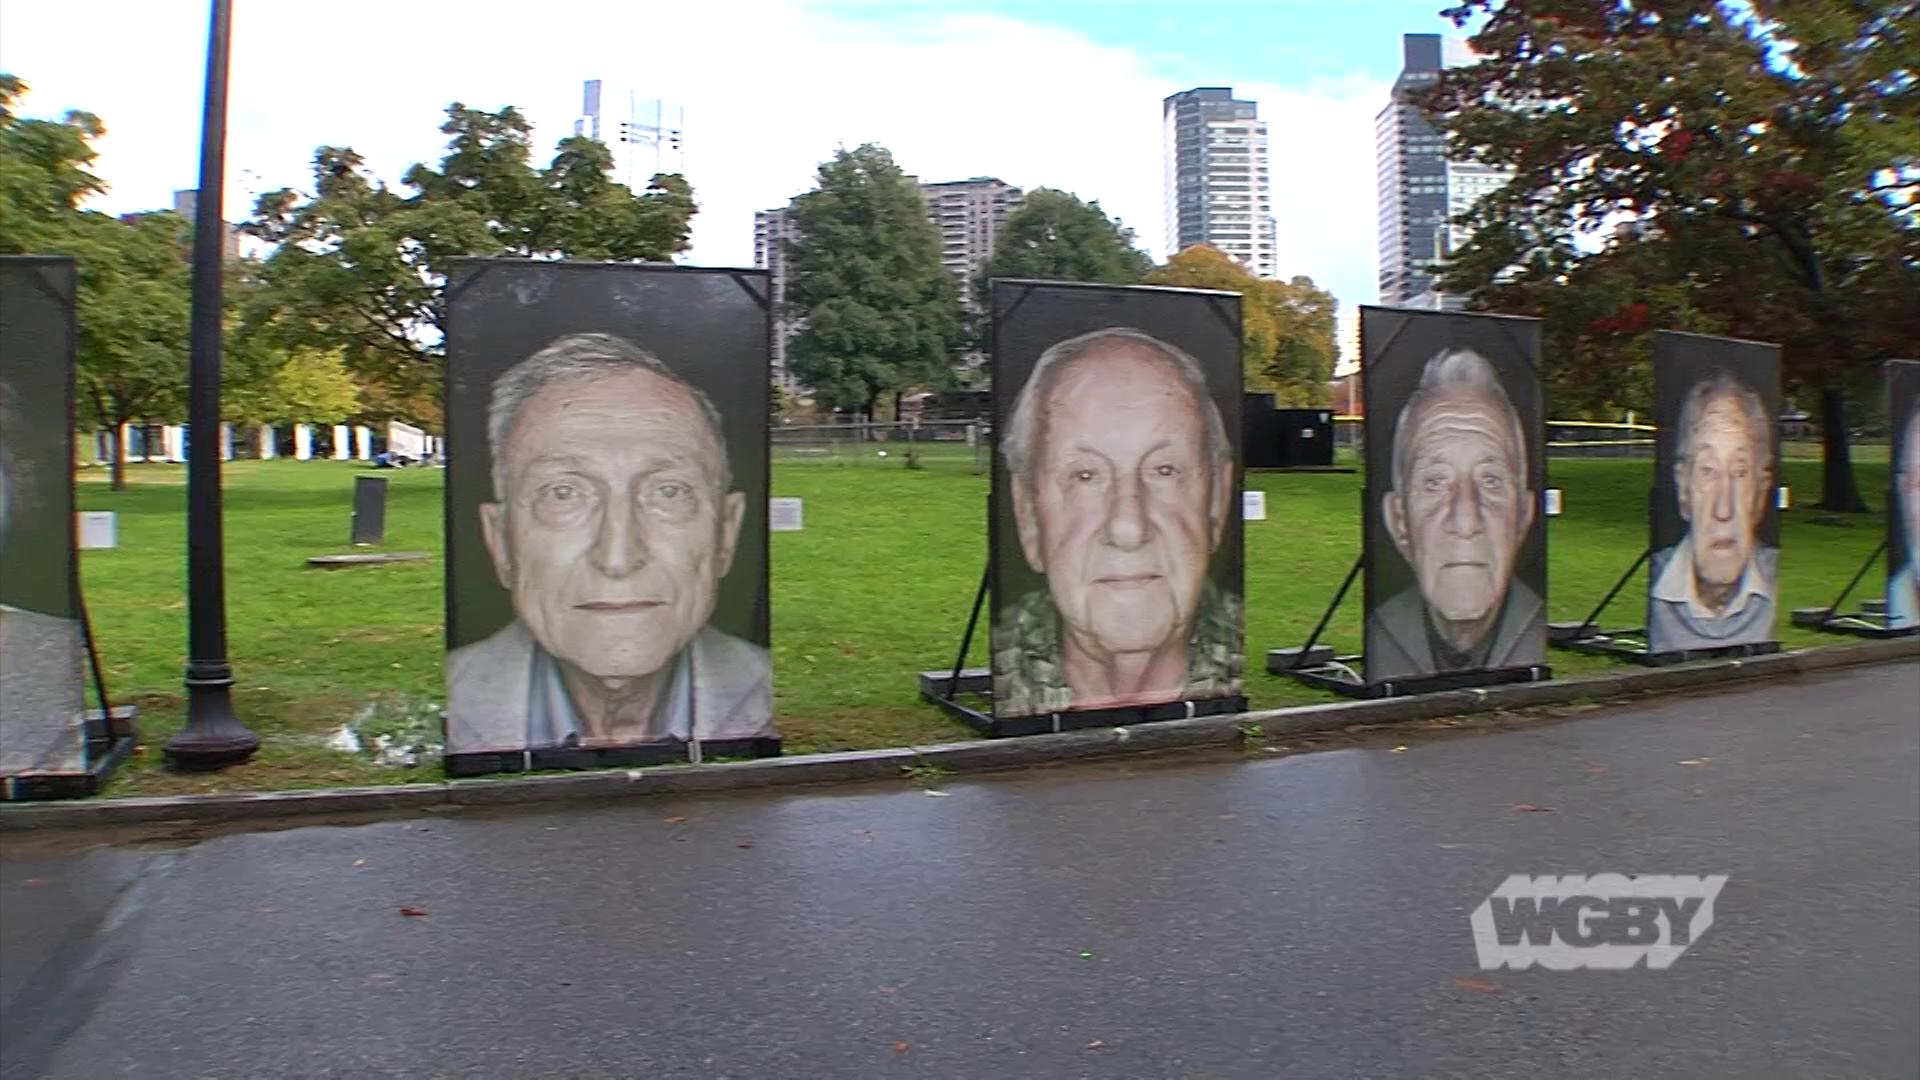 Italian-German photographer Luigi Toscano's Holocaust memorial on the Boston Common tells the harrowing stories of Holocaust survivors through public art.